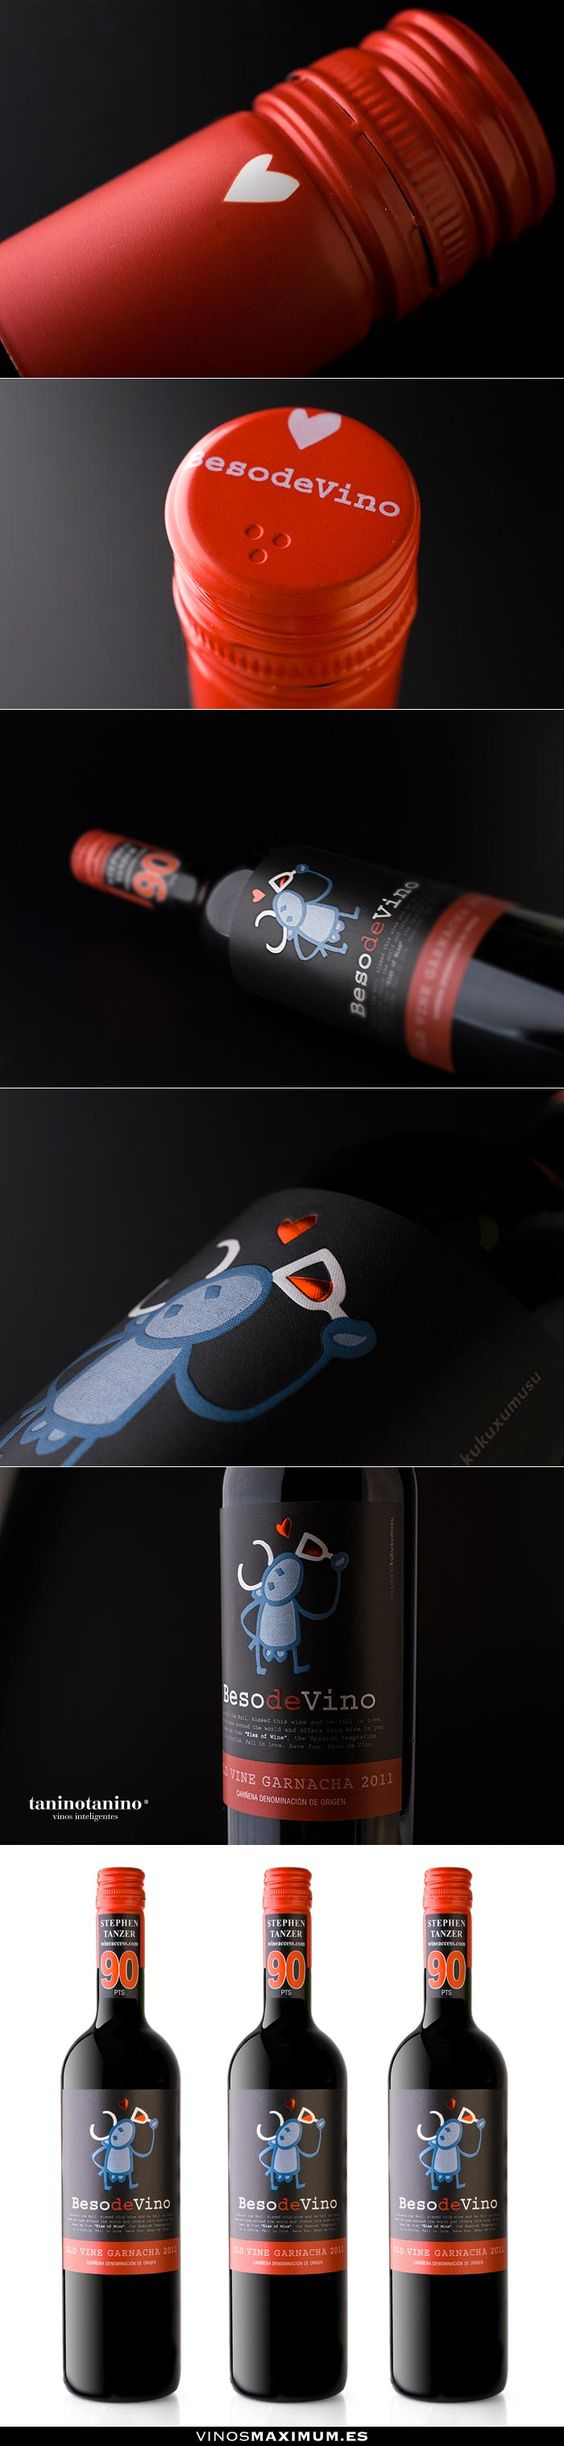 BESO DE VINO - TANINOTANINO VINOS INTELIGENTES - VINOS MAXIMUM Photo by #winebrandingdesign